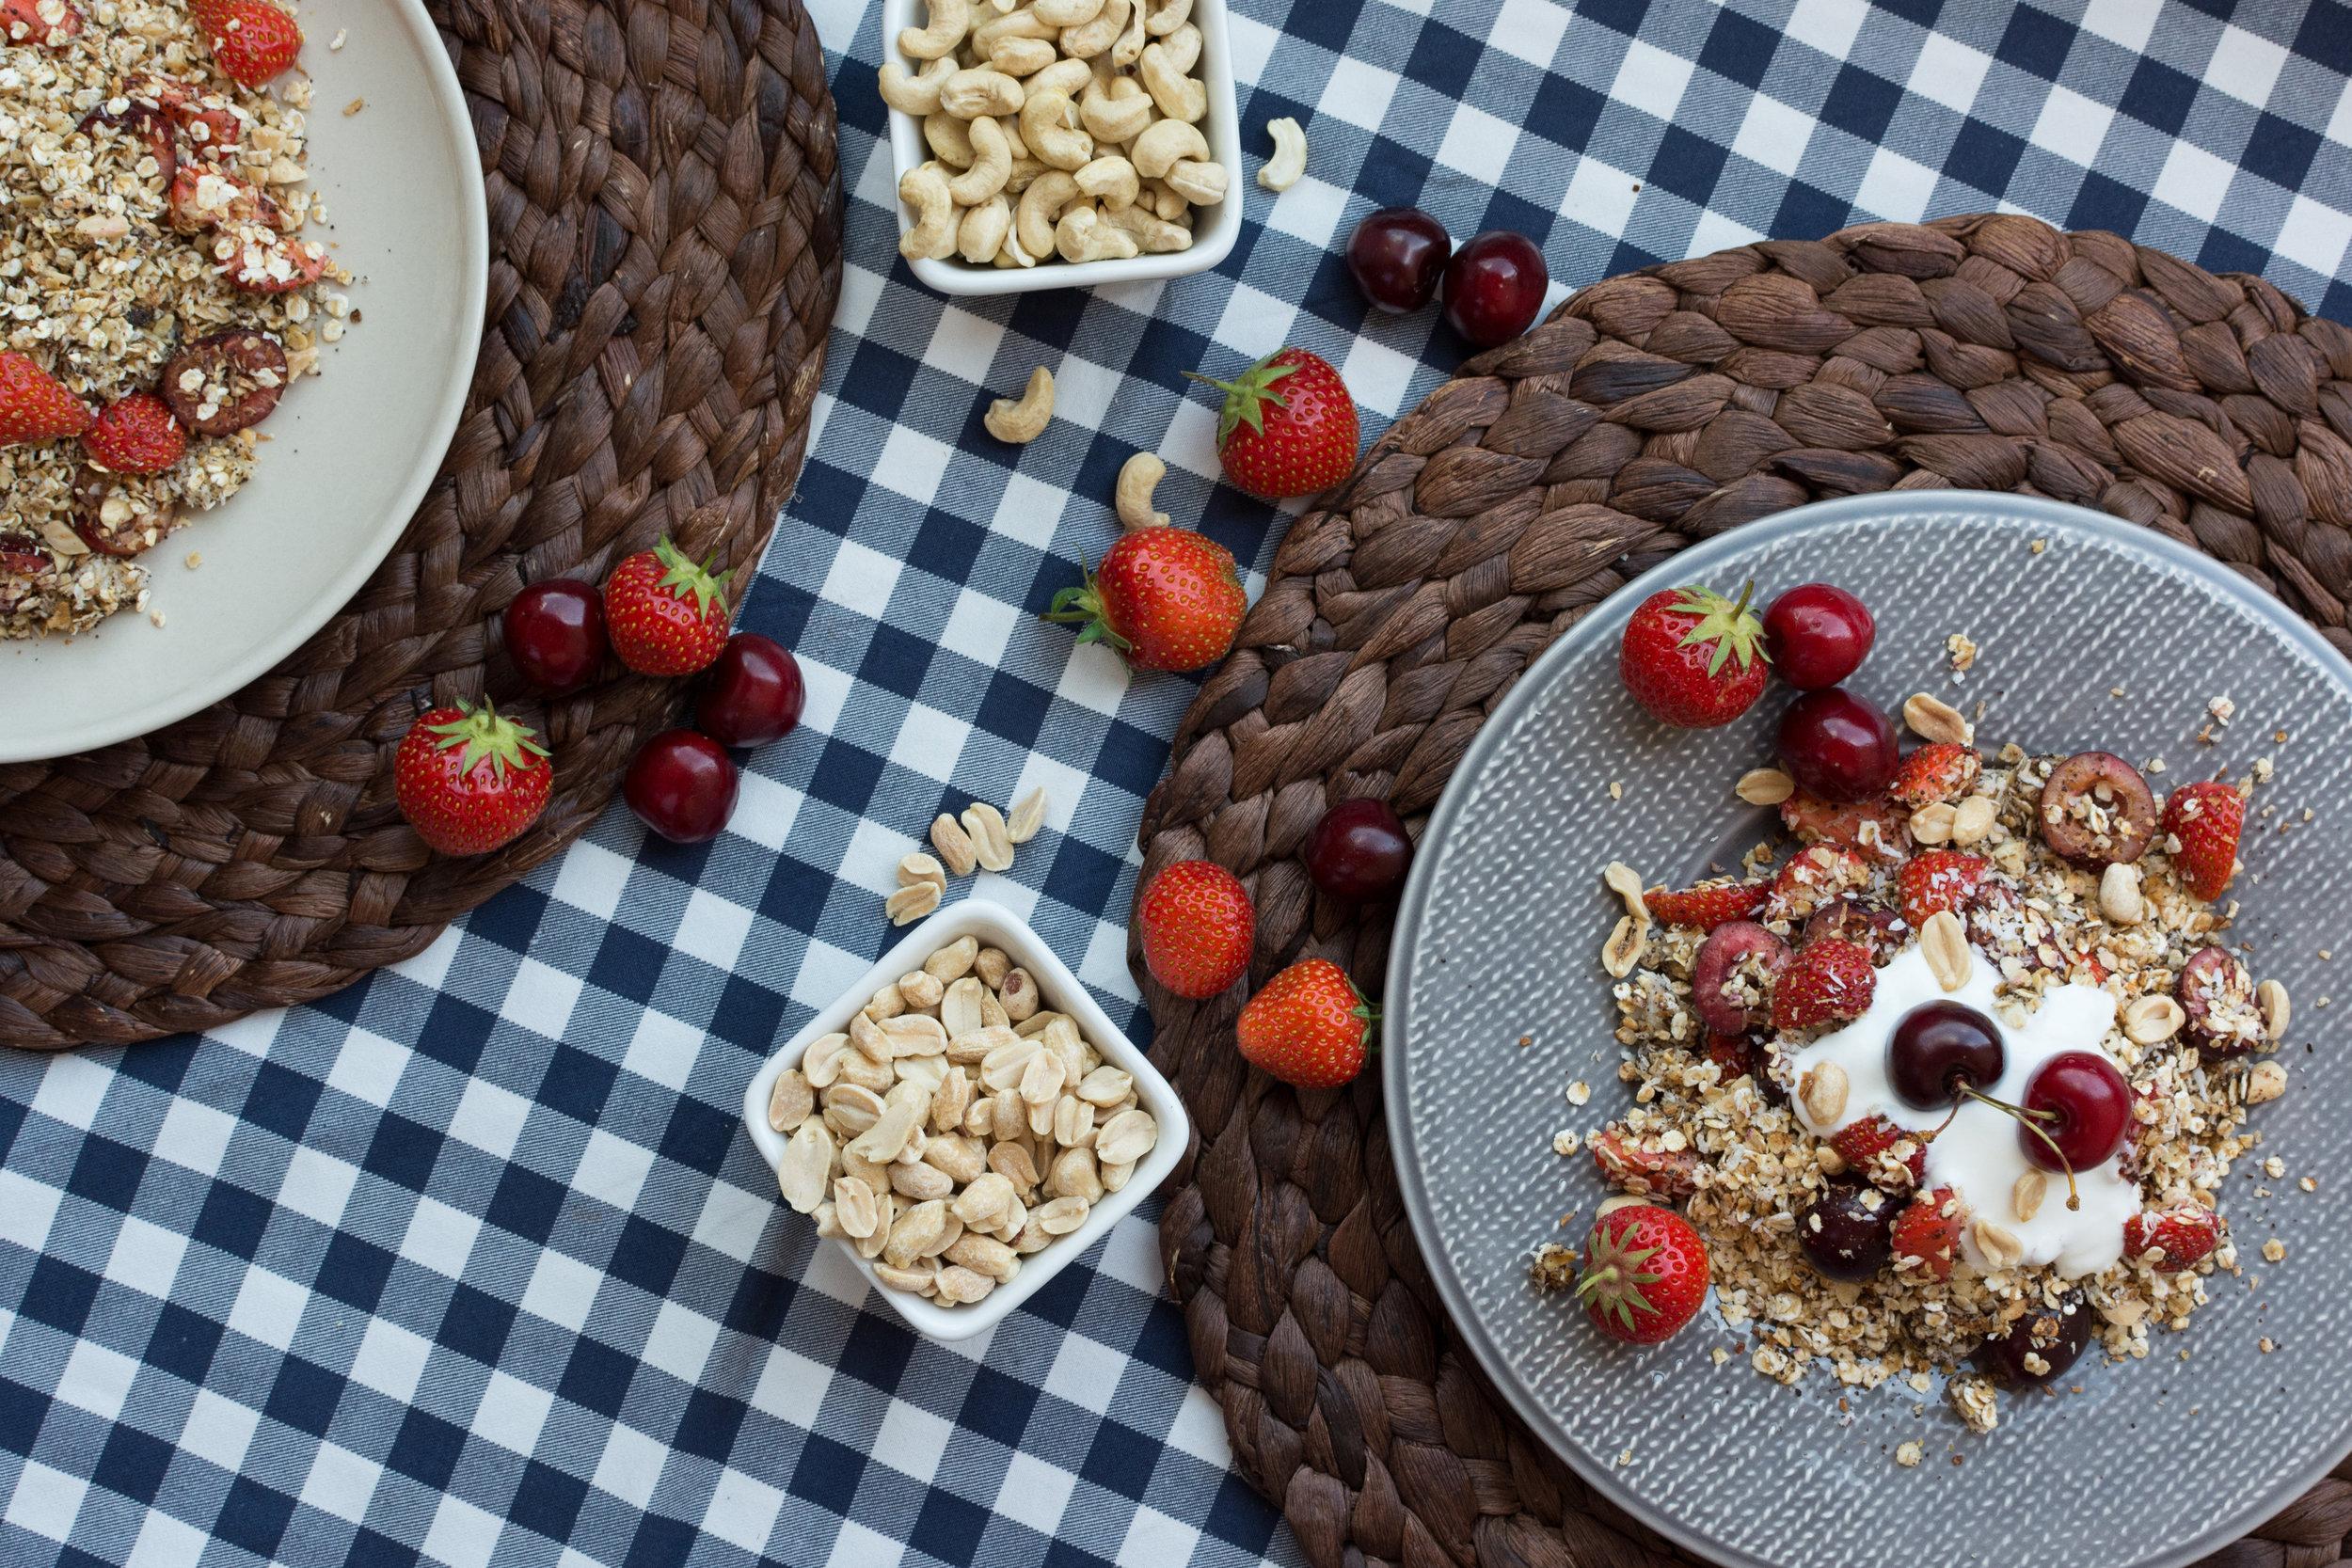 kids-breakfast-porridge-fruits-nuts-56615183